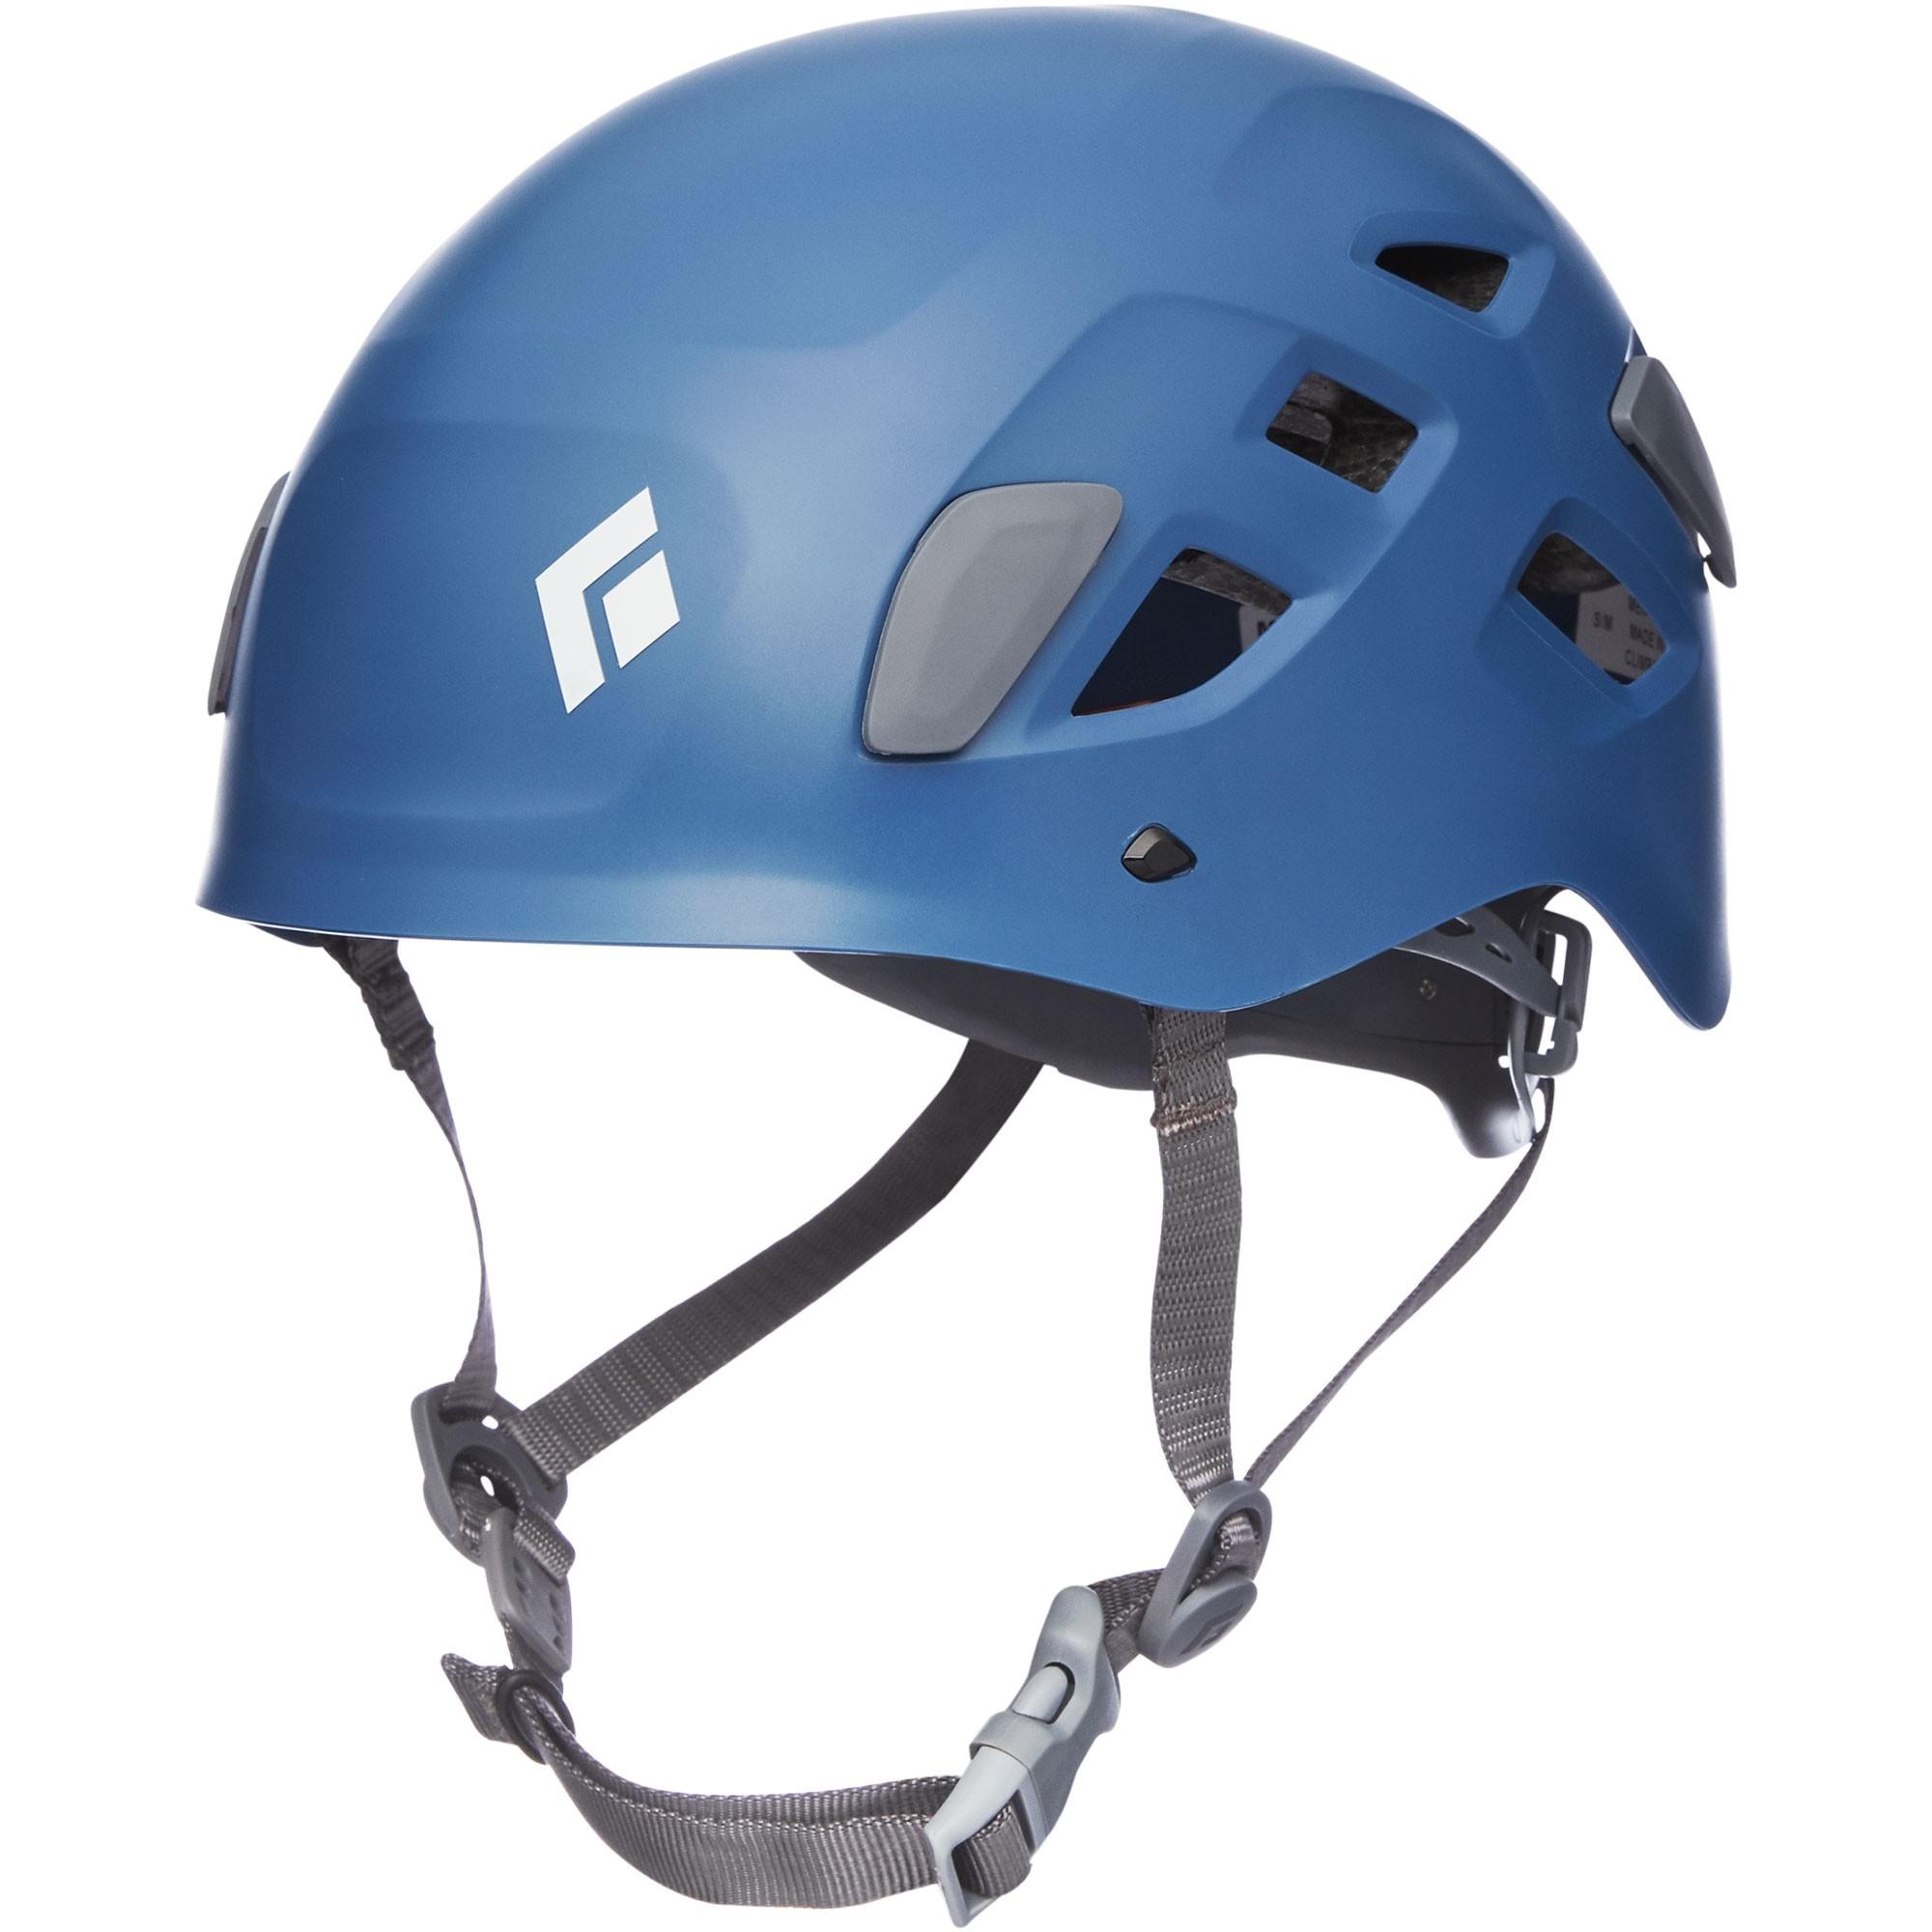 BLACK DIAMOND - Half Dome Helmet - Denim